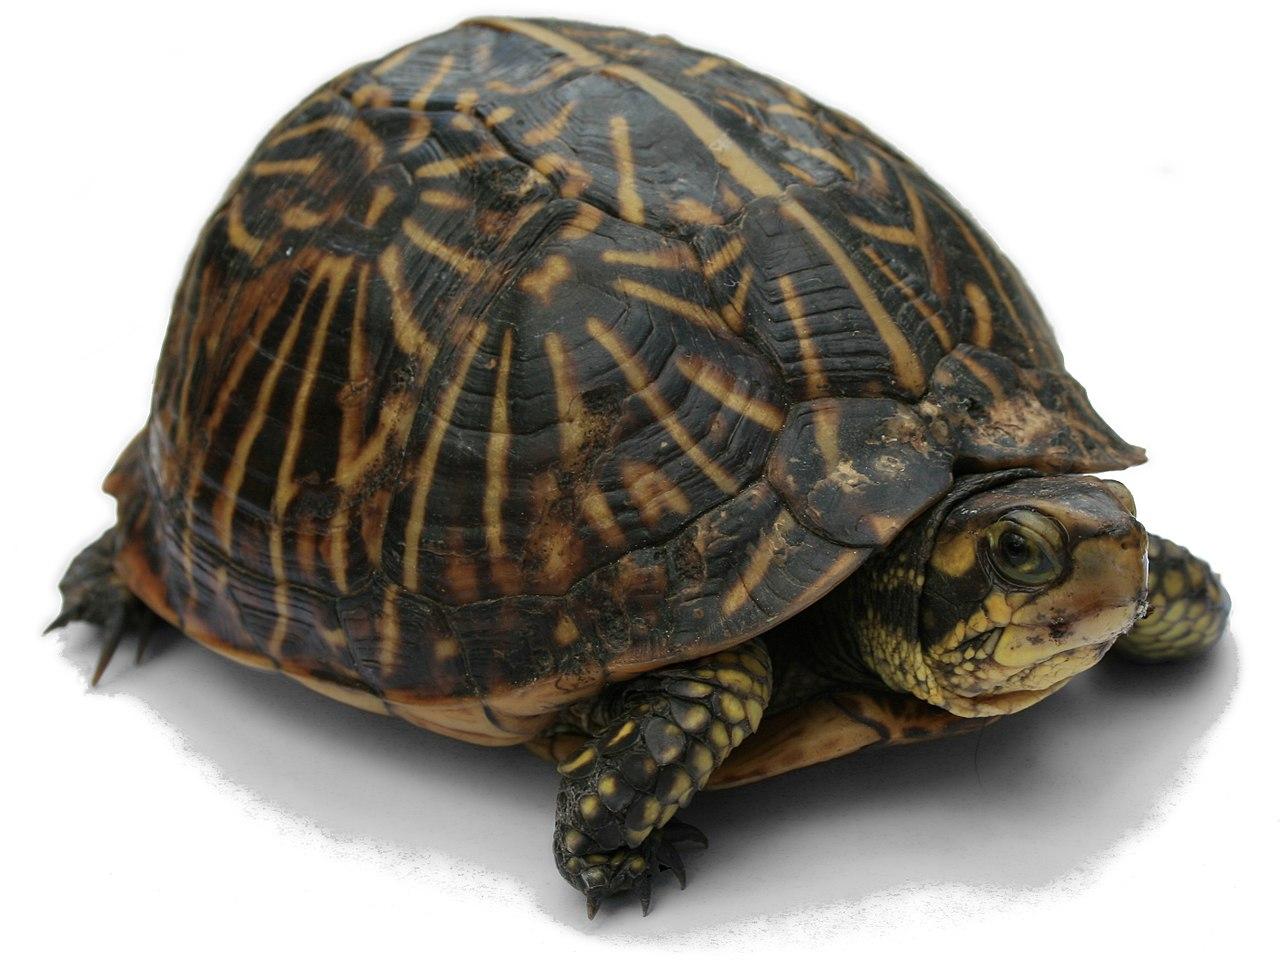 Florida Box Turtle Digon3 re-edited.jpg